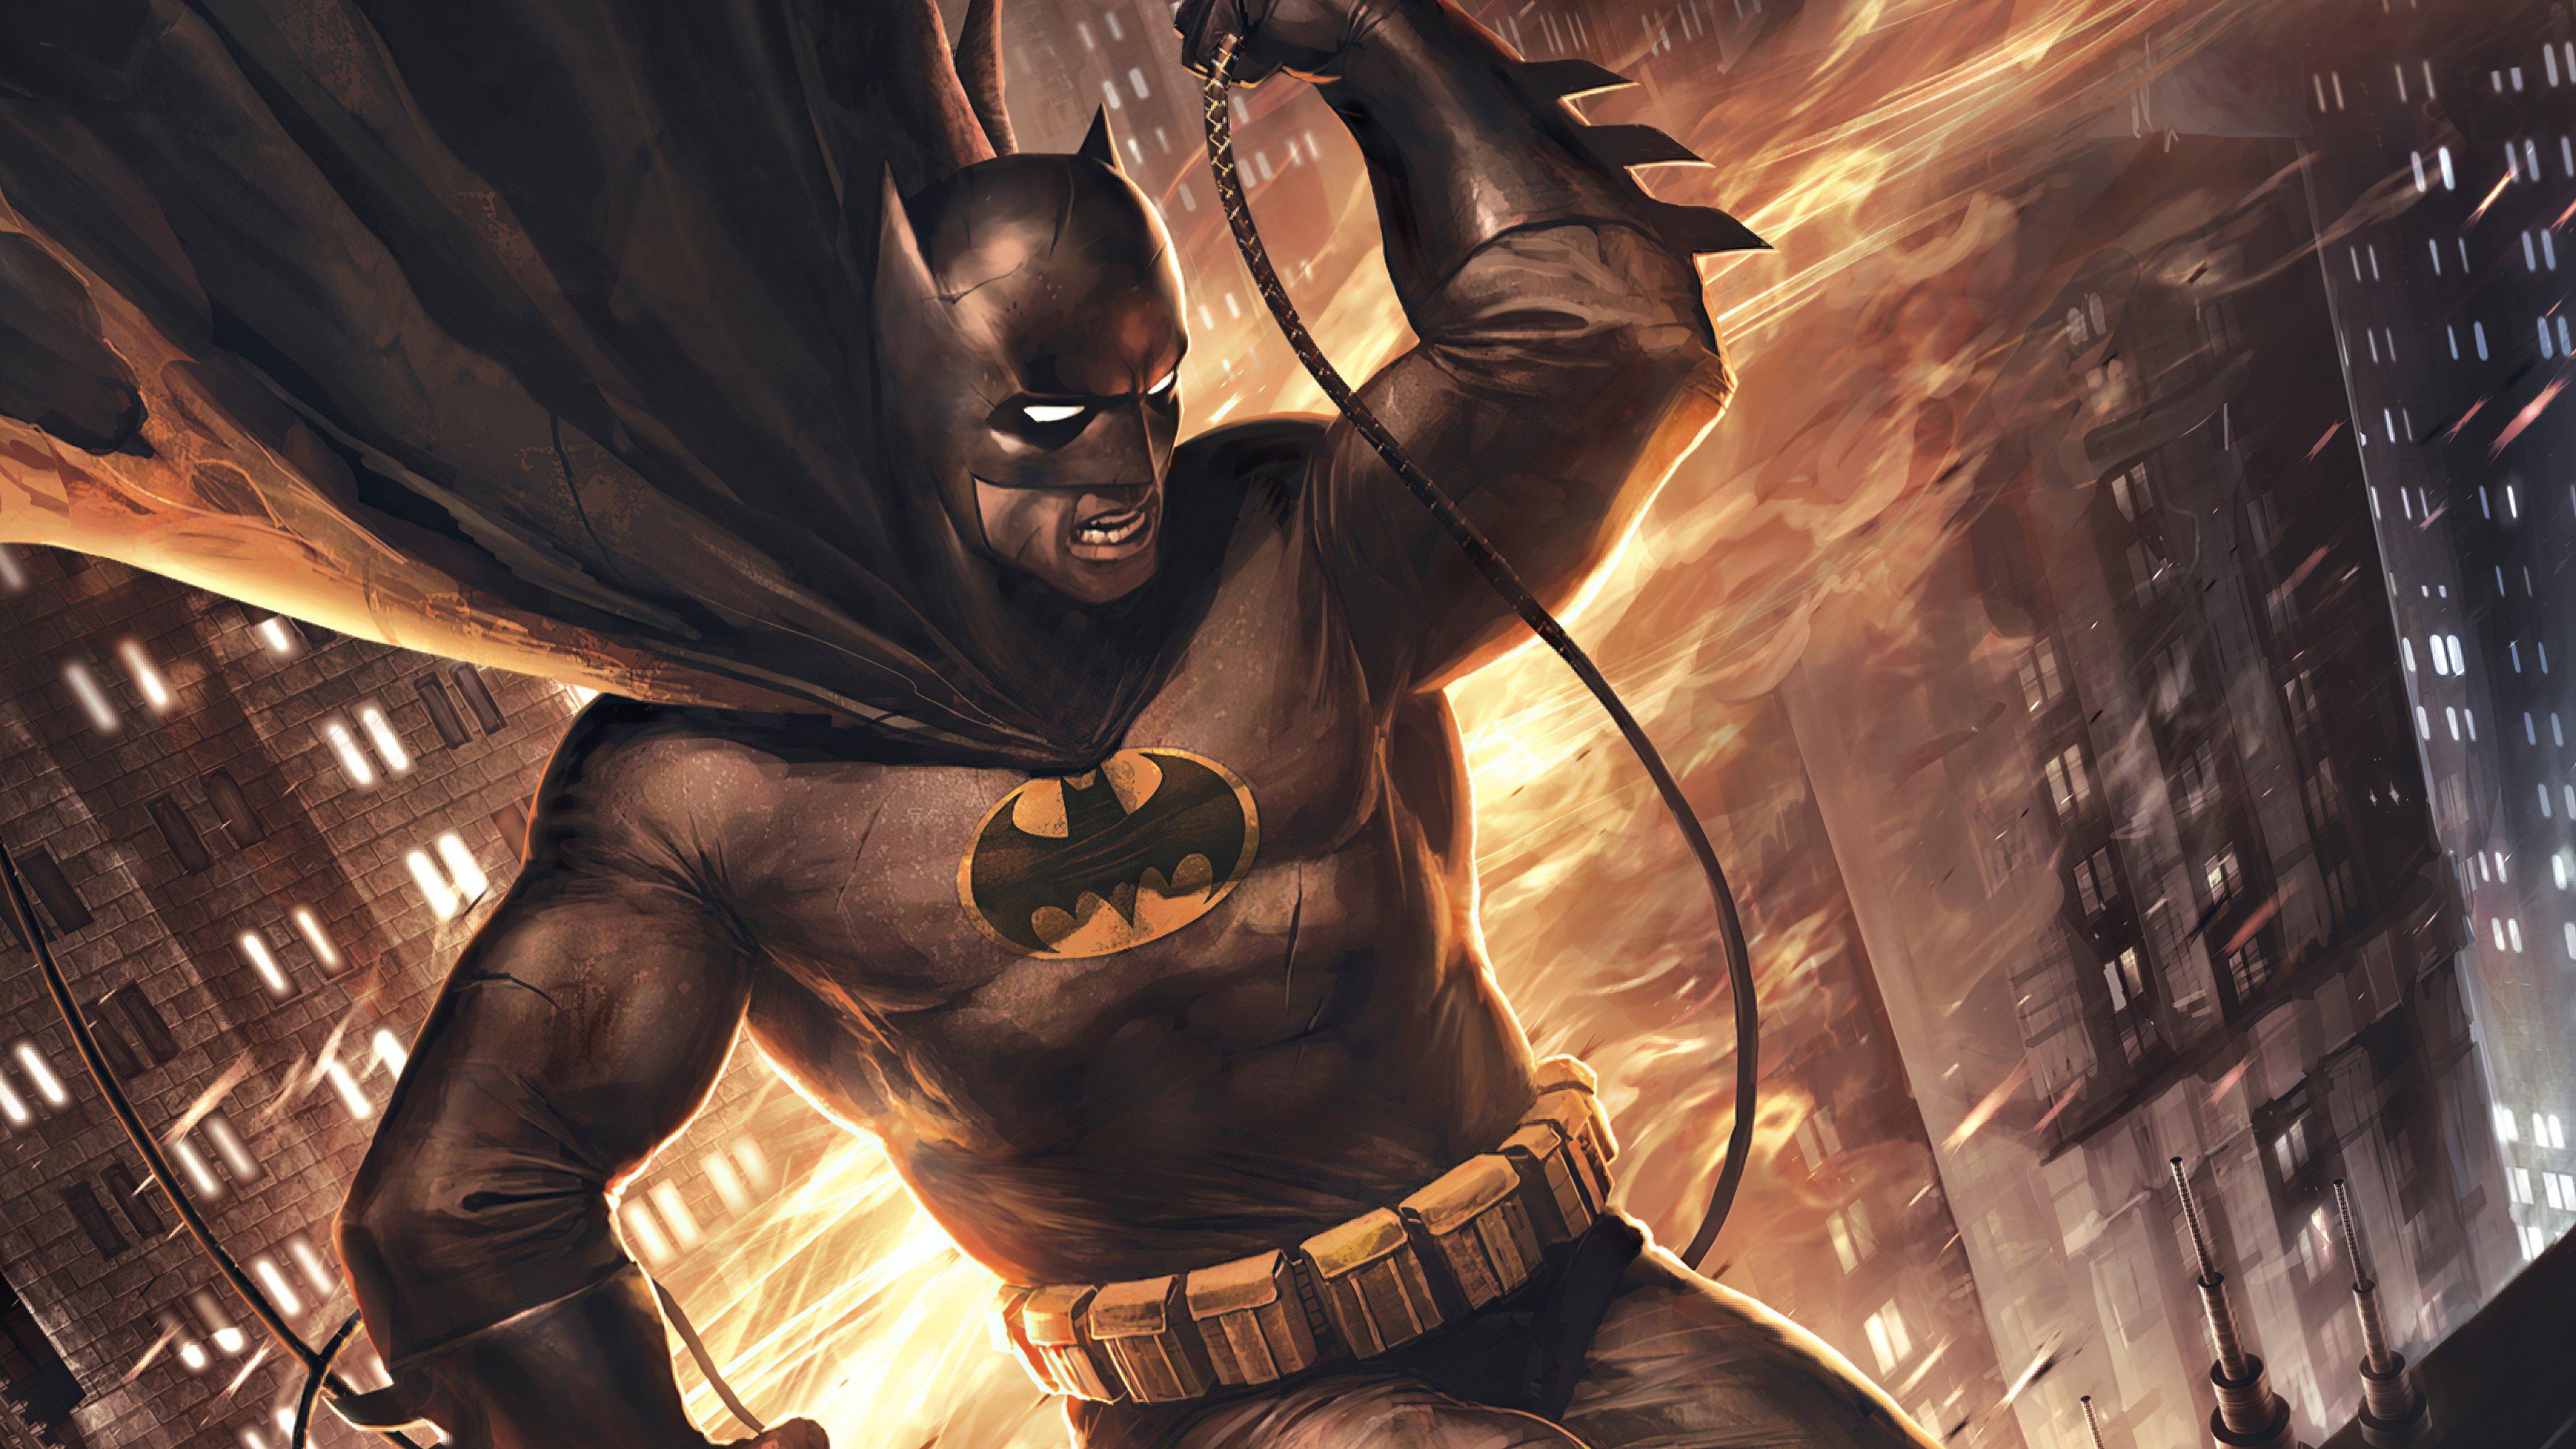 Fondos de pantalla Batman El cabellero de la noche regresa